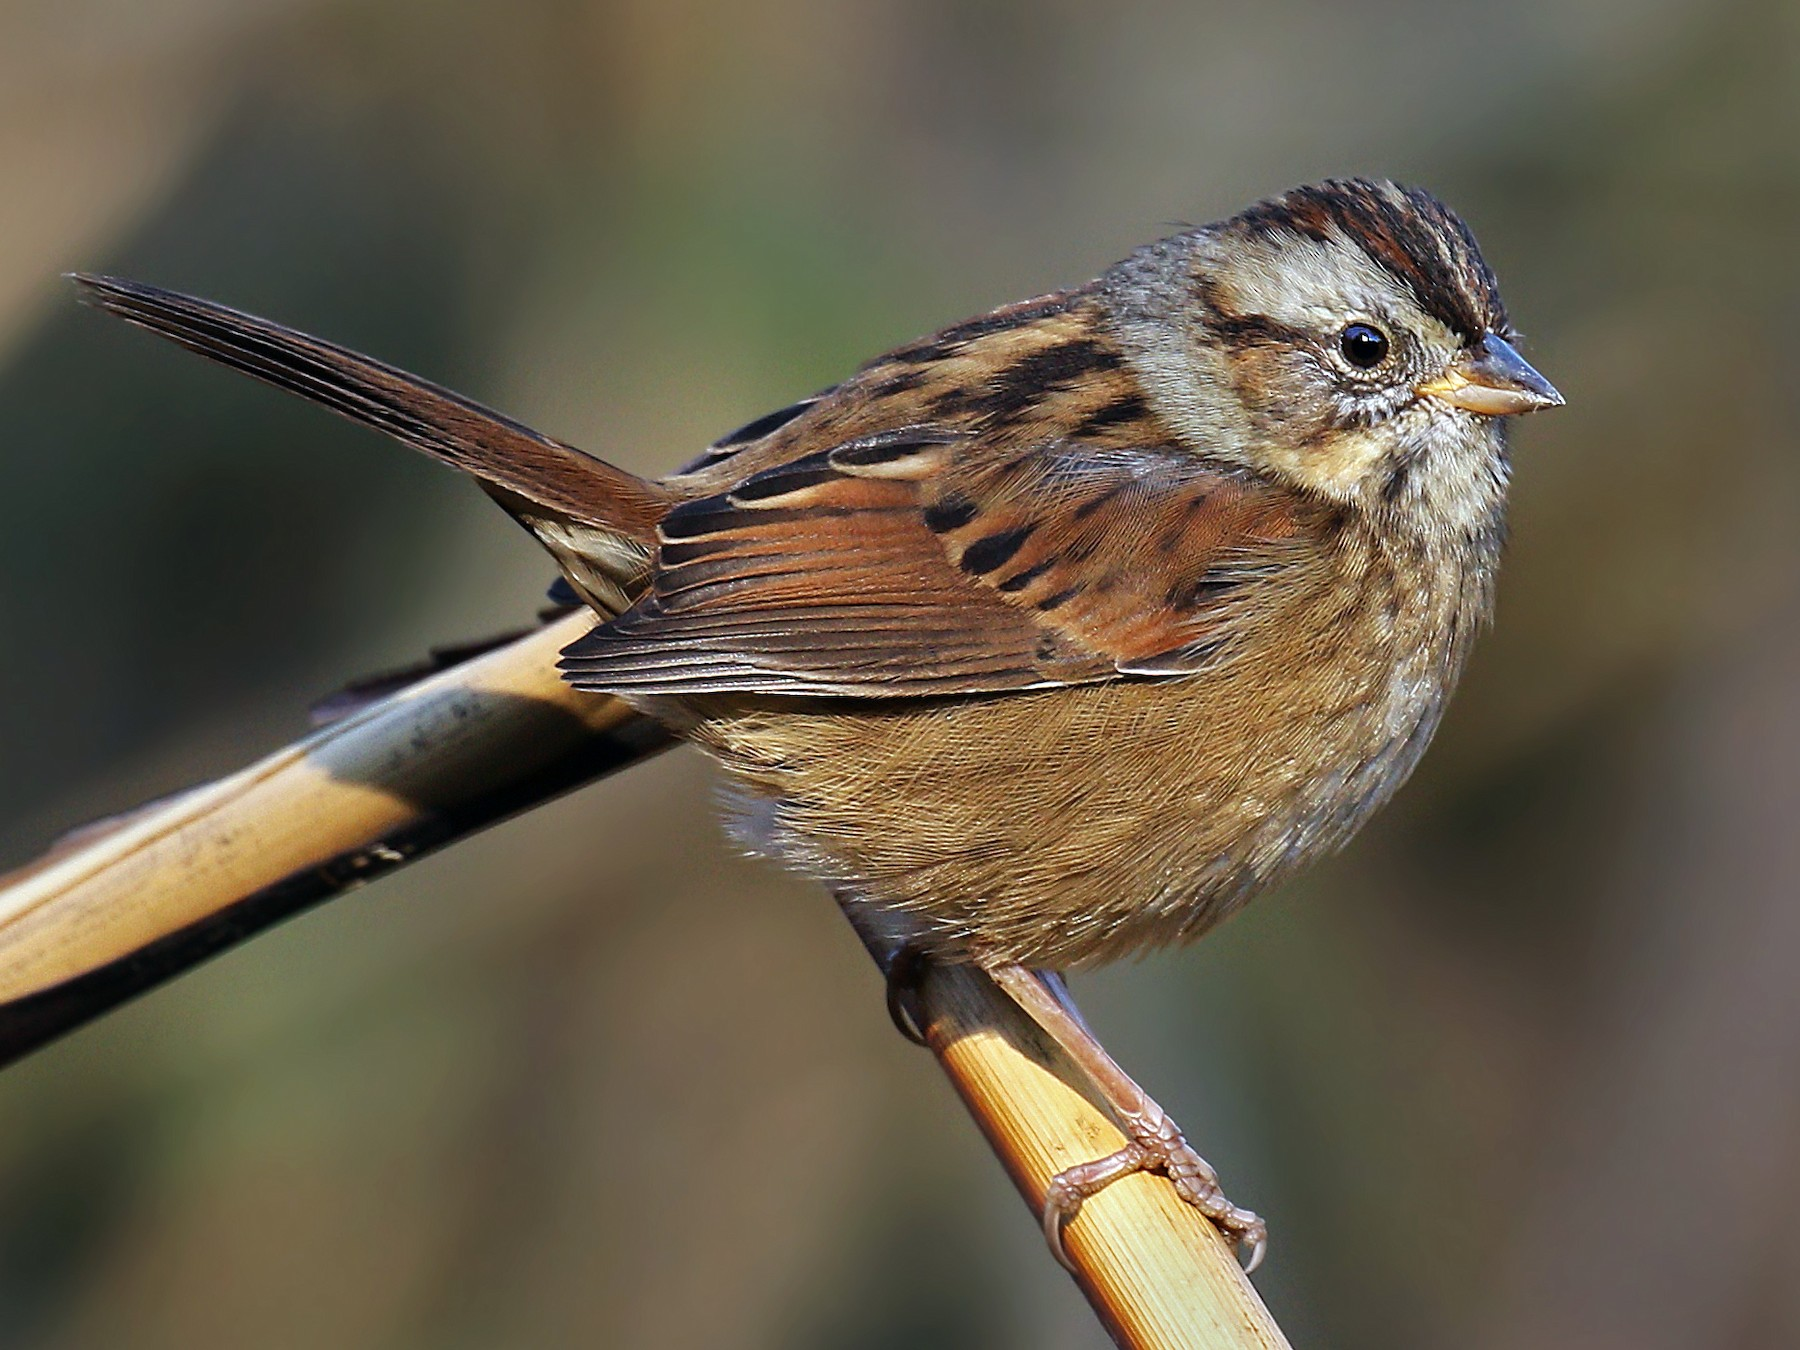 Swamp Sparrow - Ryan Schain